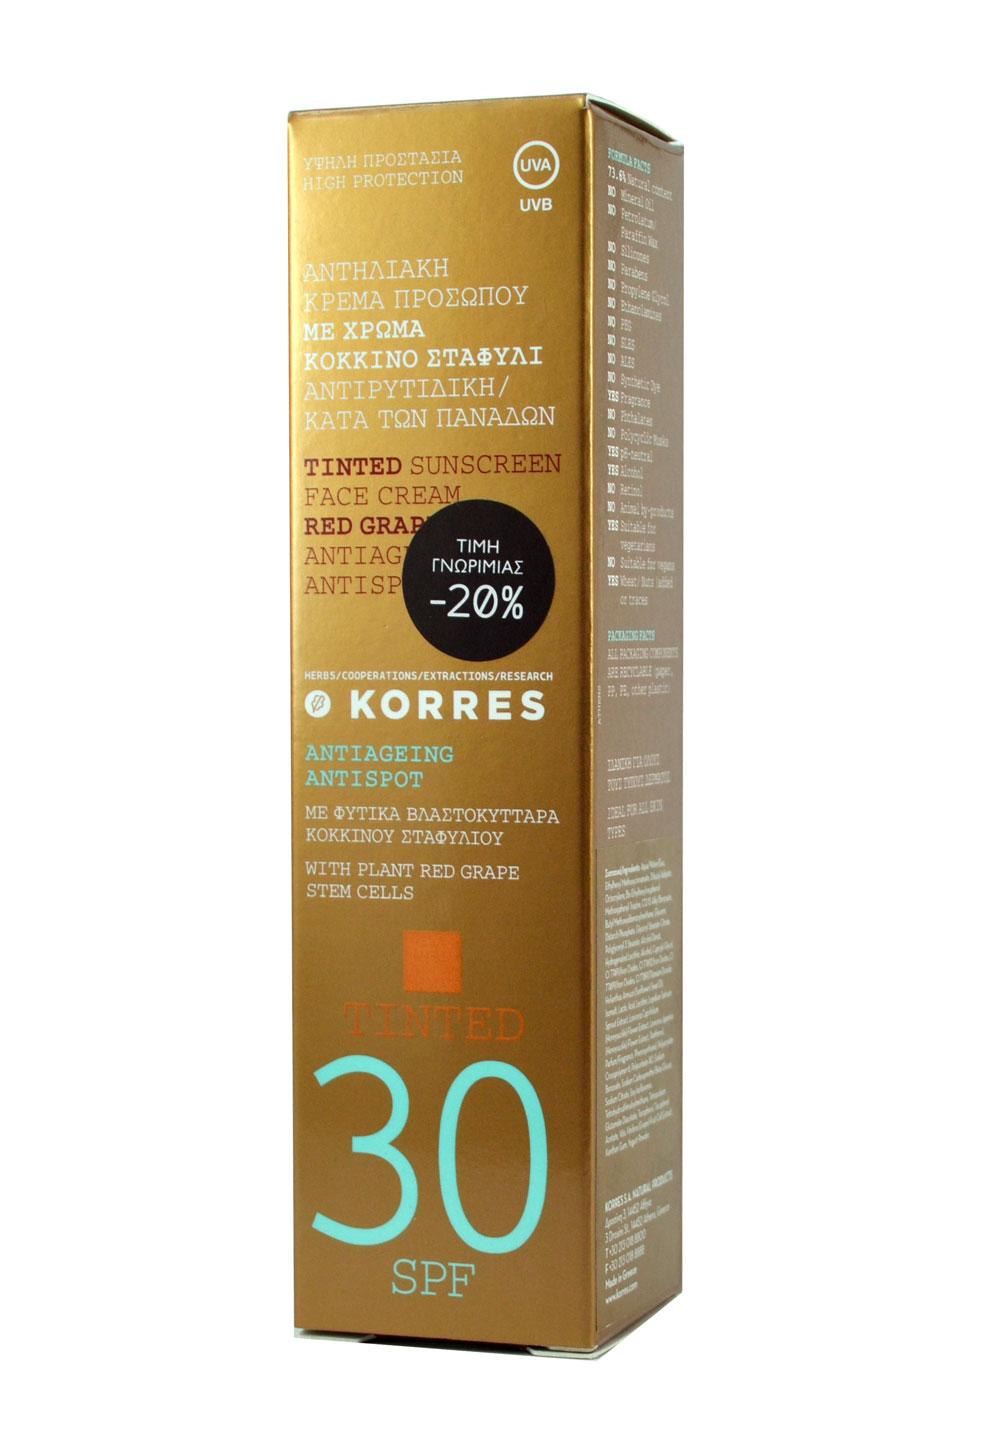 Korres Αντιηλιακή Κρέμα Προσώπου Κόκκινο Σταφύλι με Χρώμα SPF30 50ml